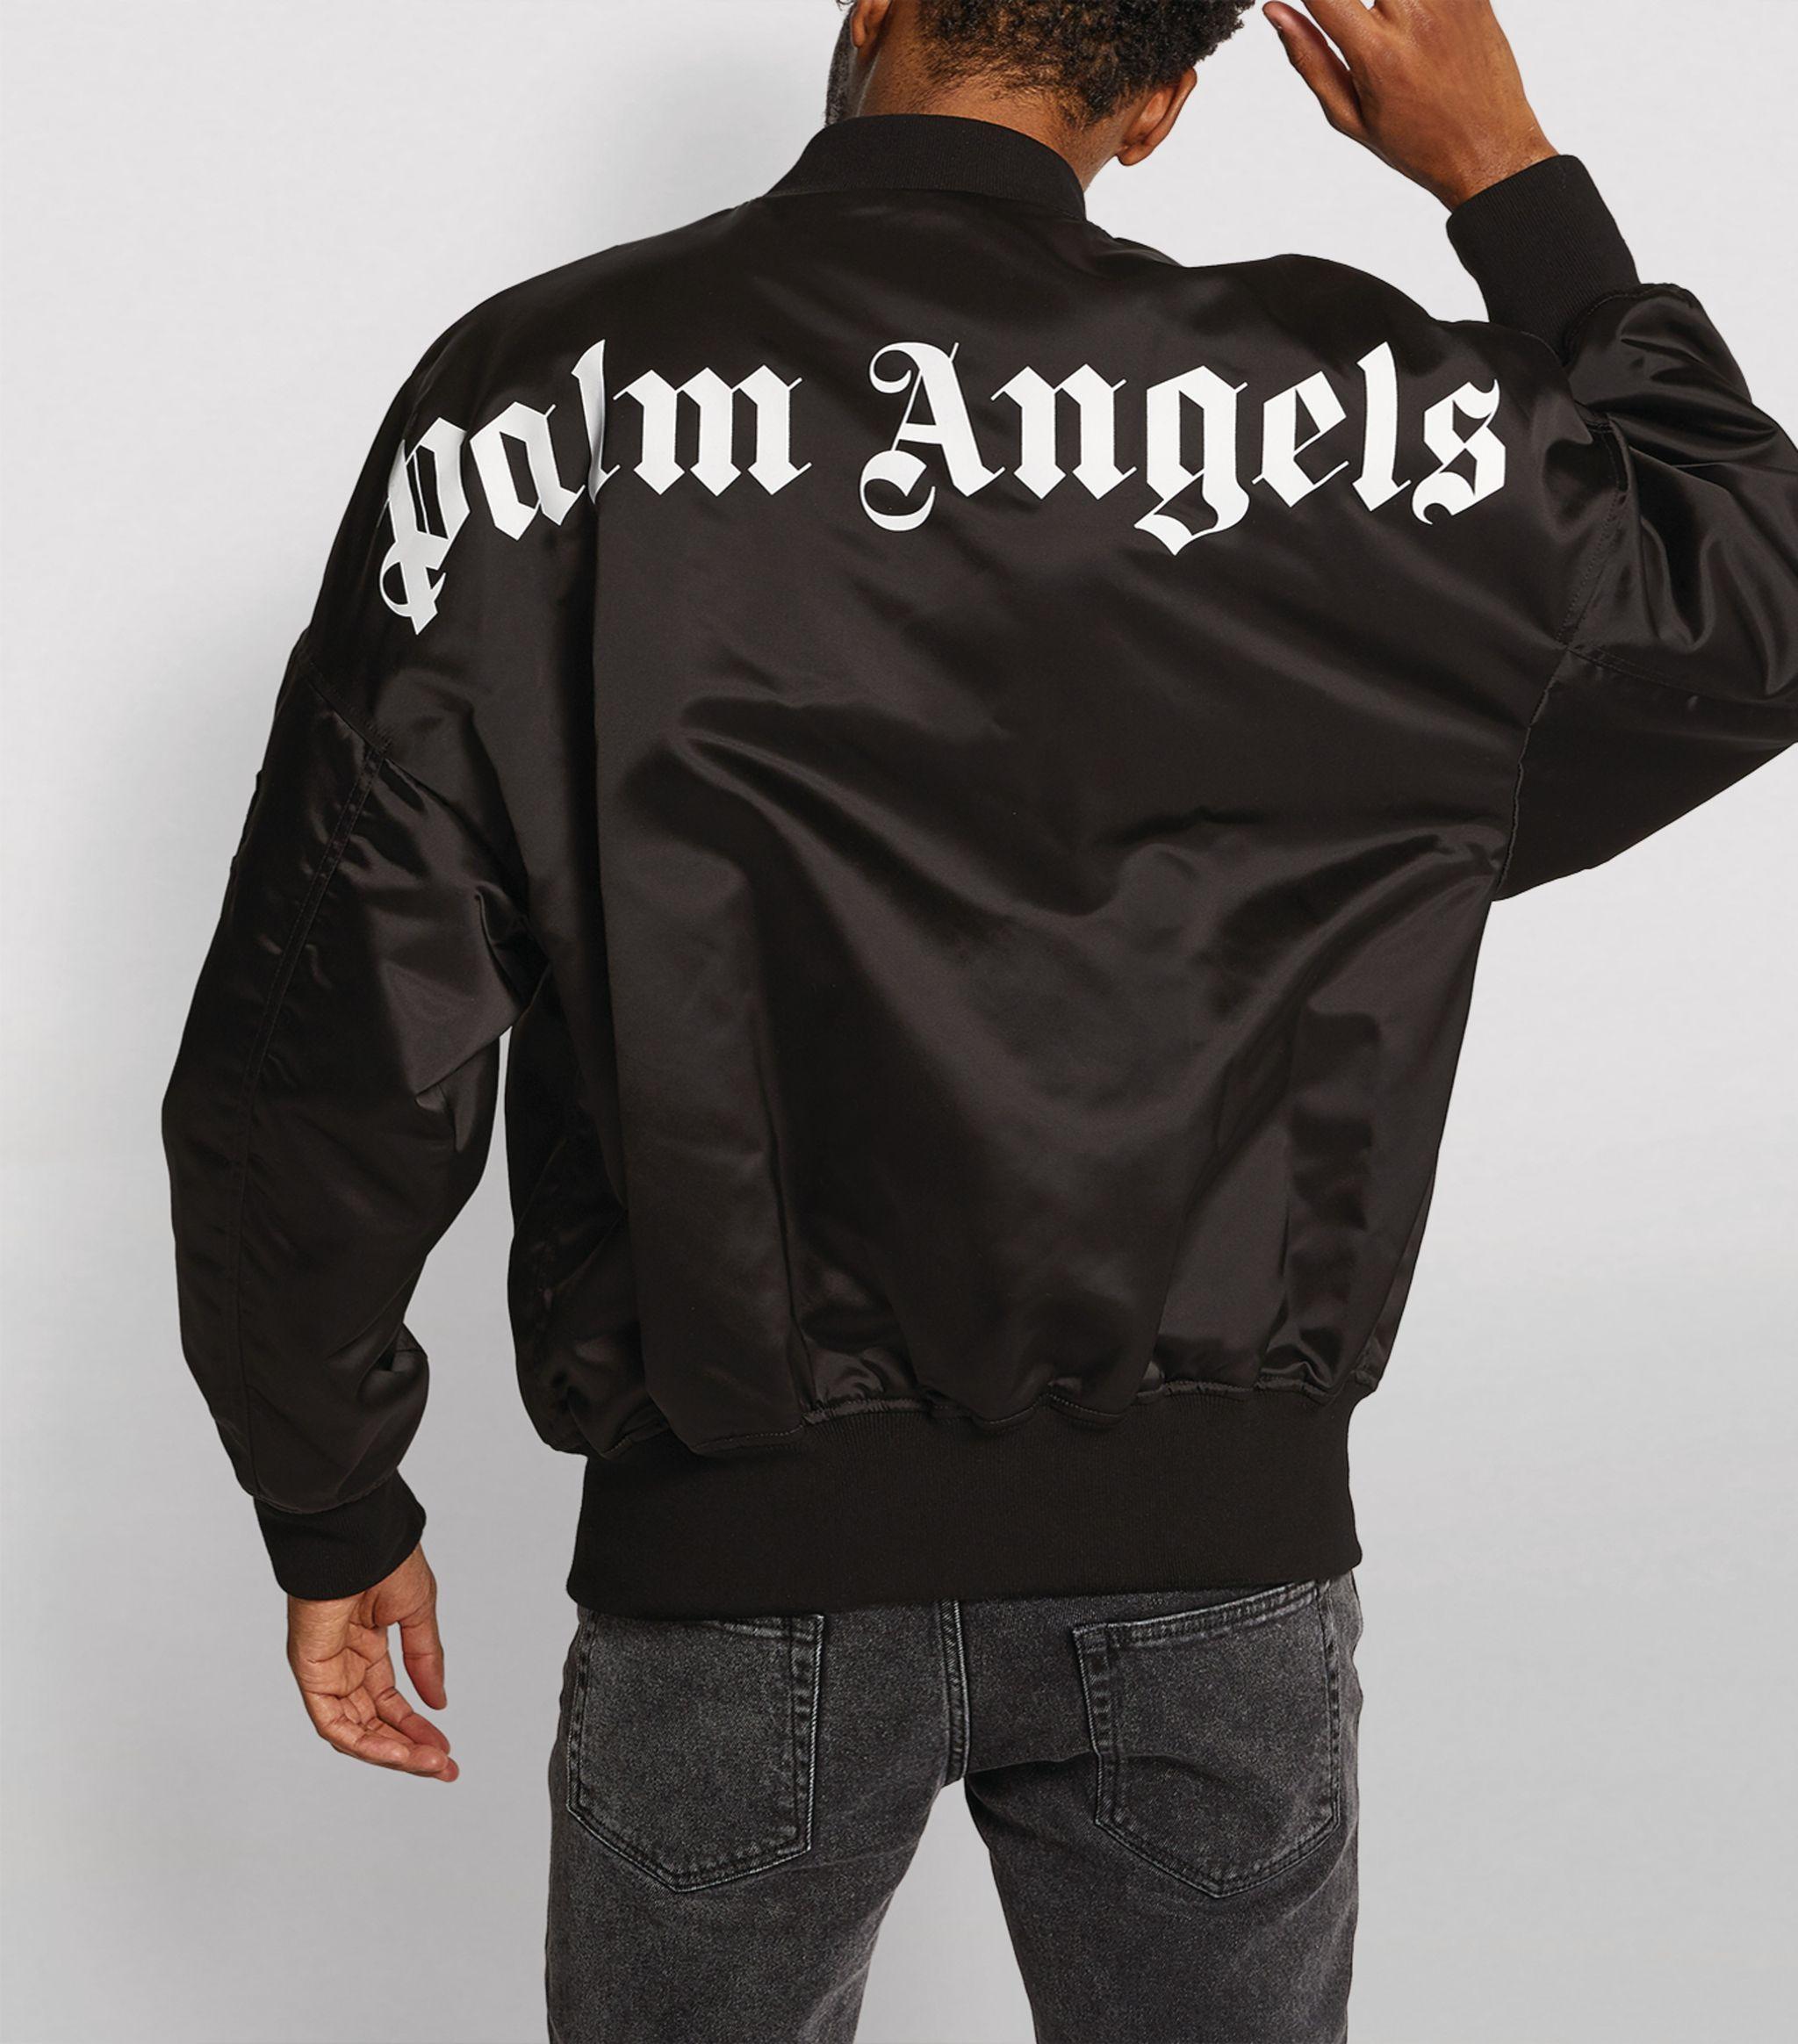 Palm Angels Black Logo Bomber Jacket Harrods Uk Ad Ad Black Logo Palm Angels Harrods Bomer Jacket Jackets Active Wear For Women [ 2328 x 2048 Pixel ]